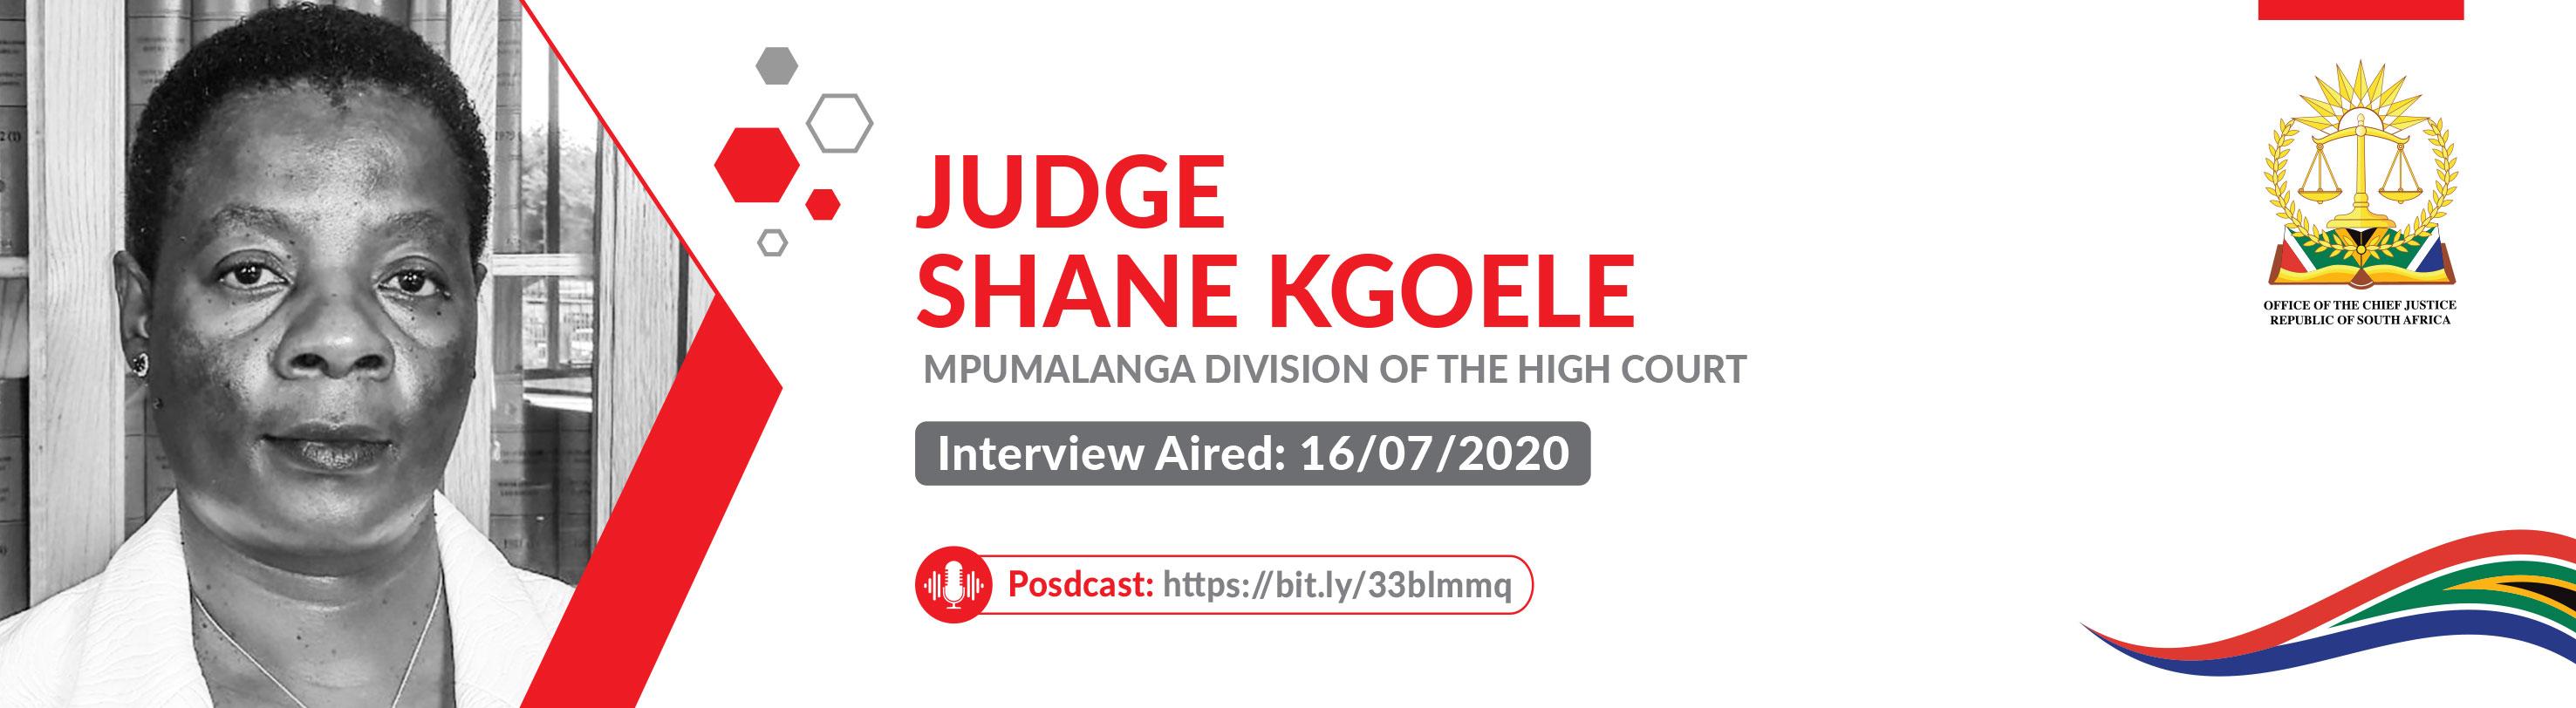 Web_Judge-Kgoele